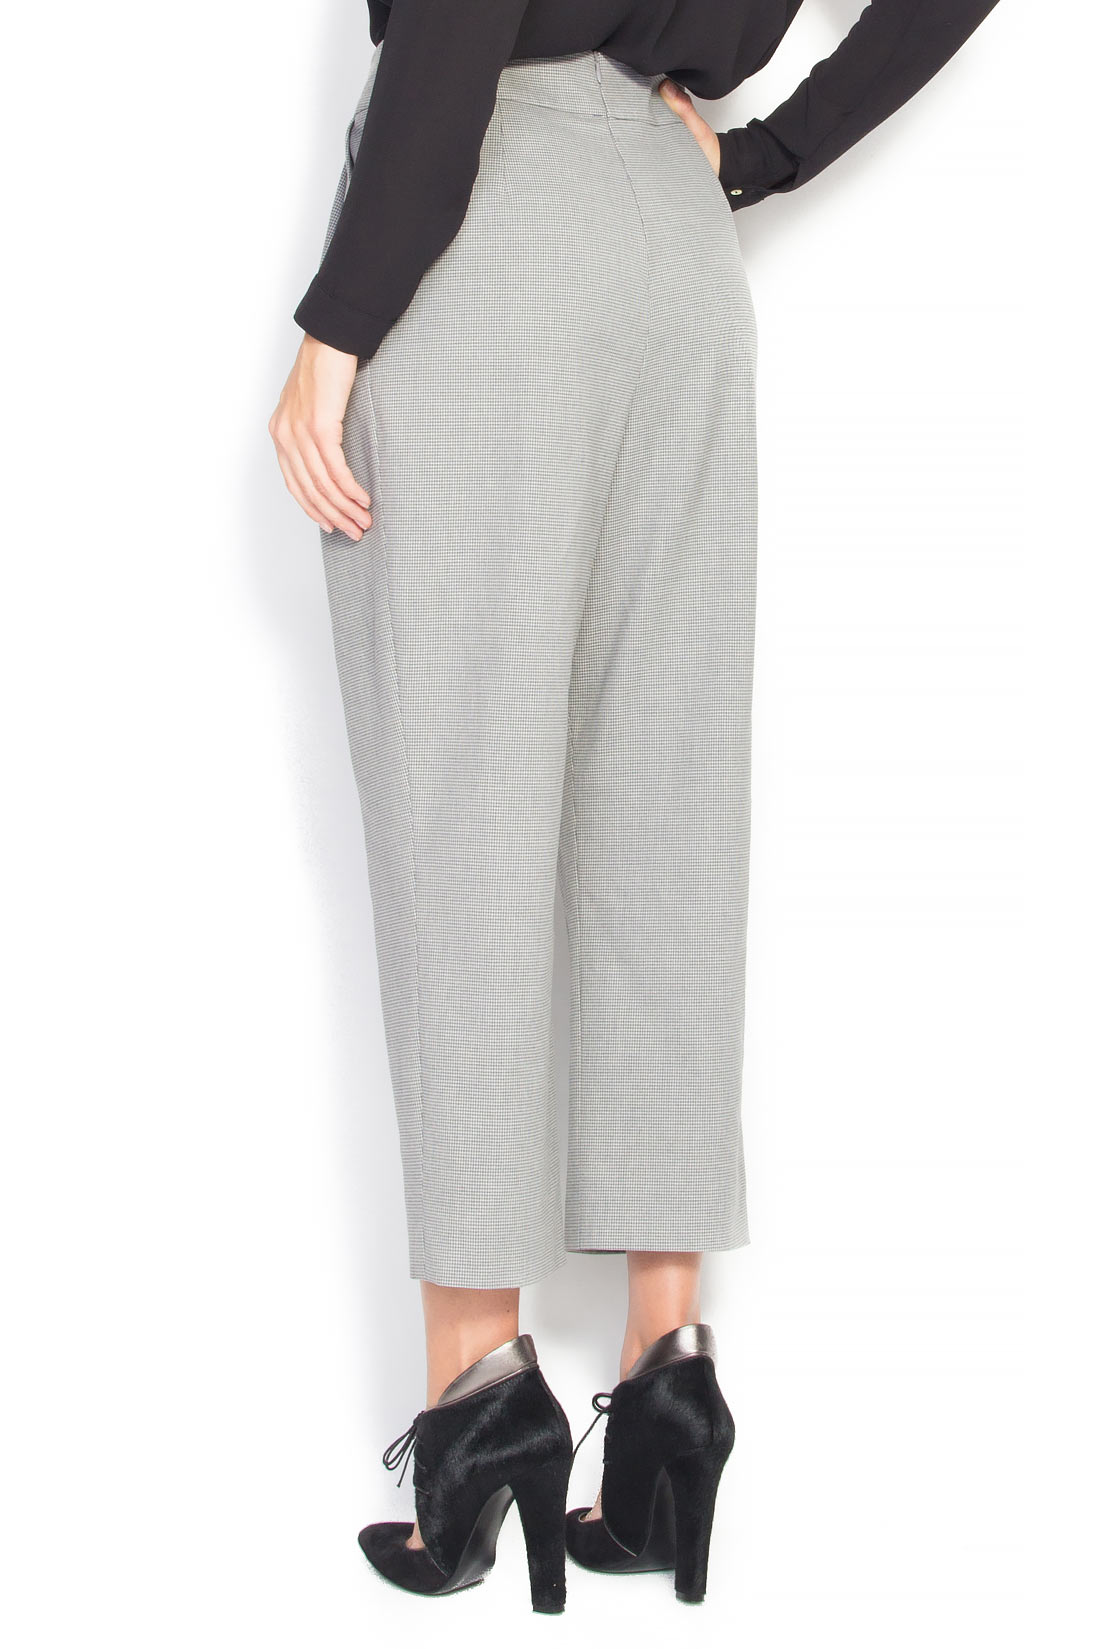 Pantaloni din bumbac cu talia inalta Claudia Castrase imagine 2